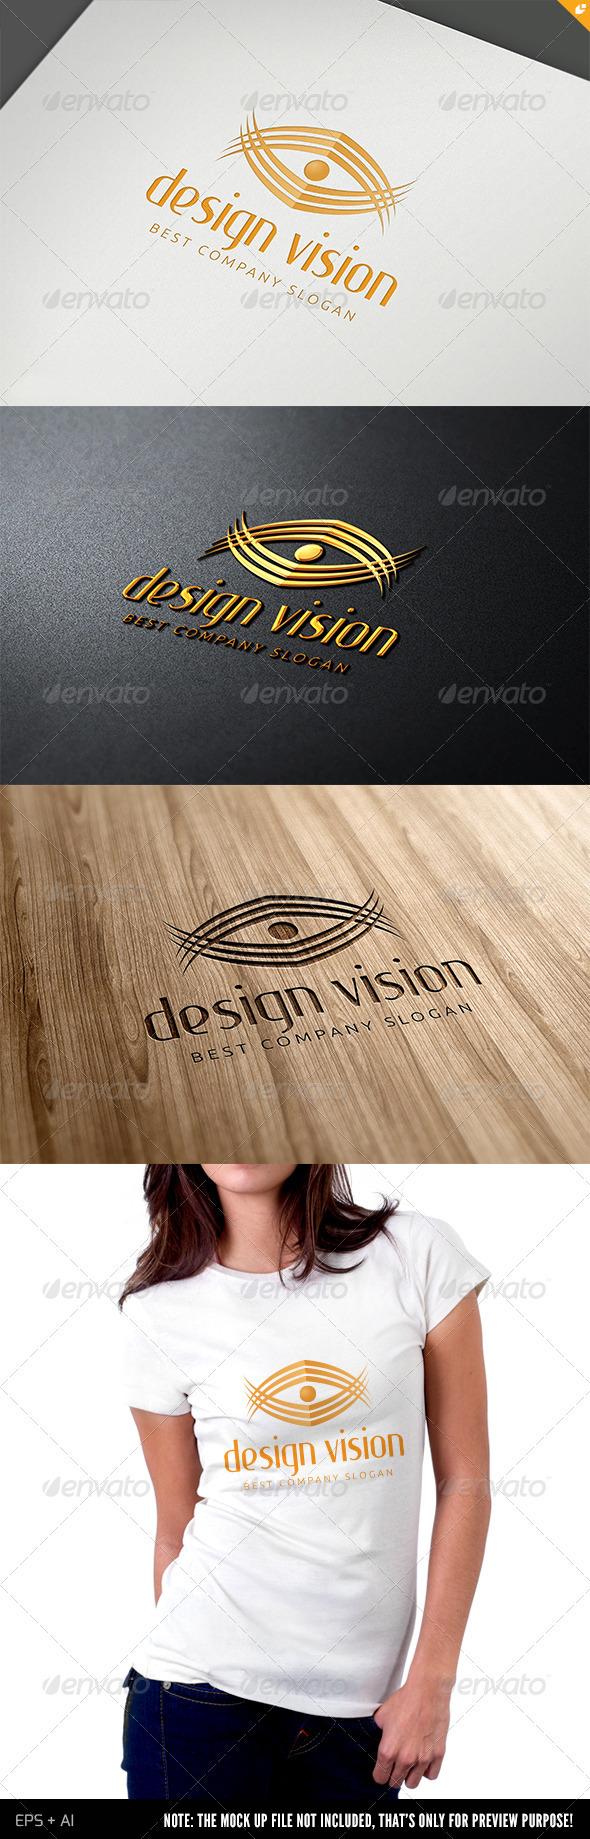 GraphicRiver Media Design Vision Logo 4000618